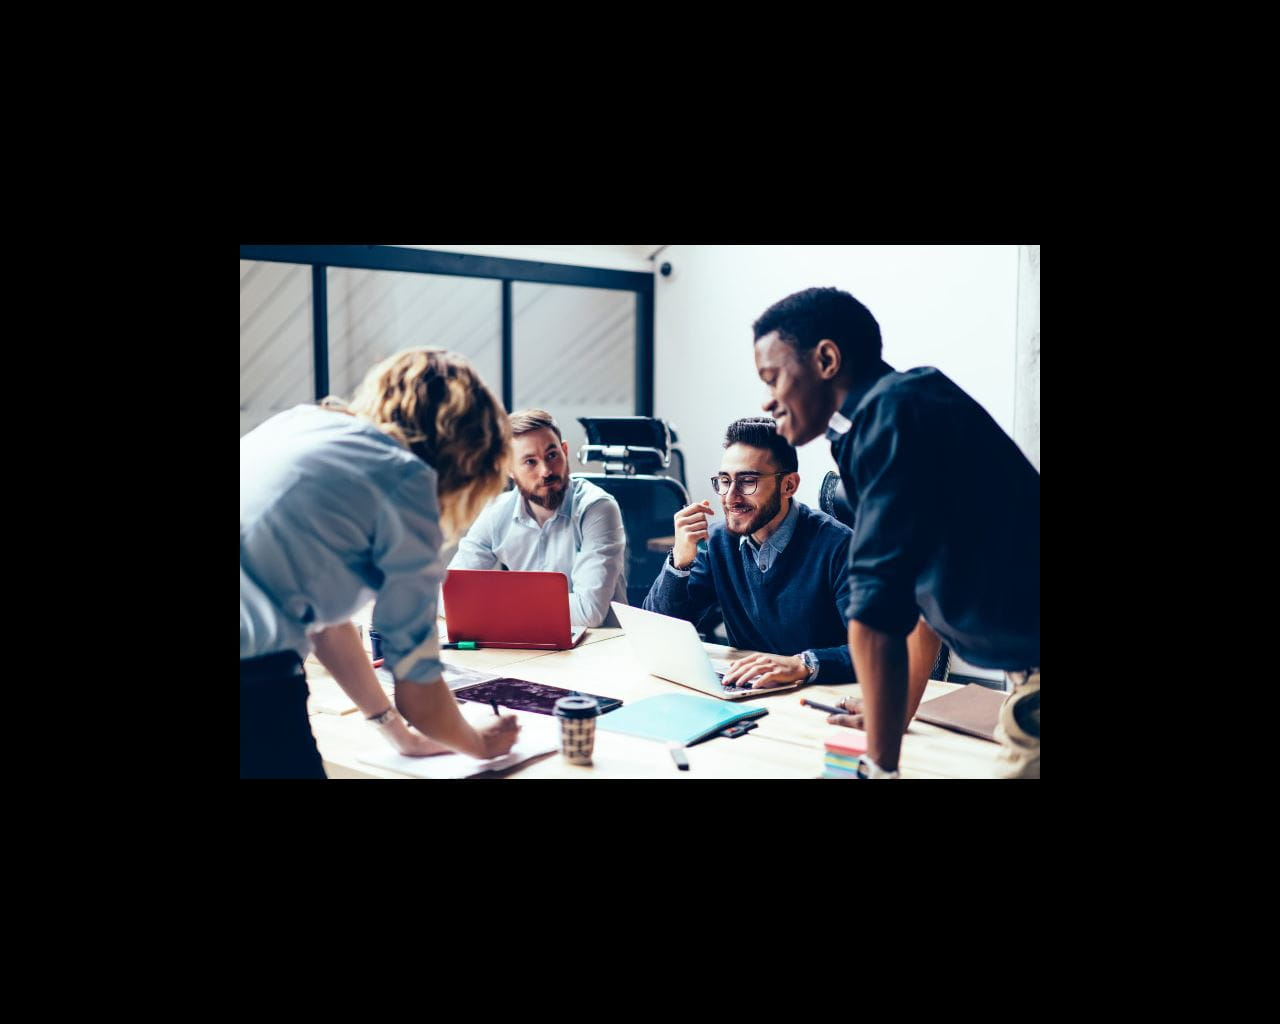 Facilitating Content Management in SharePoint with Pictureparks Digital Asset Platform